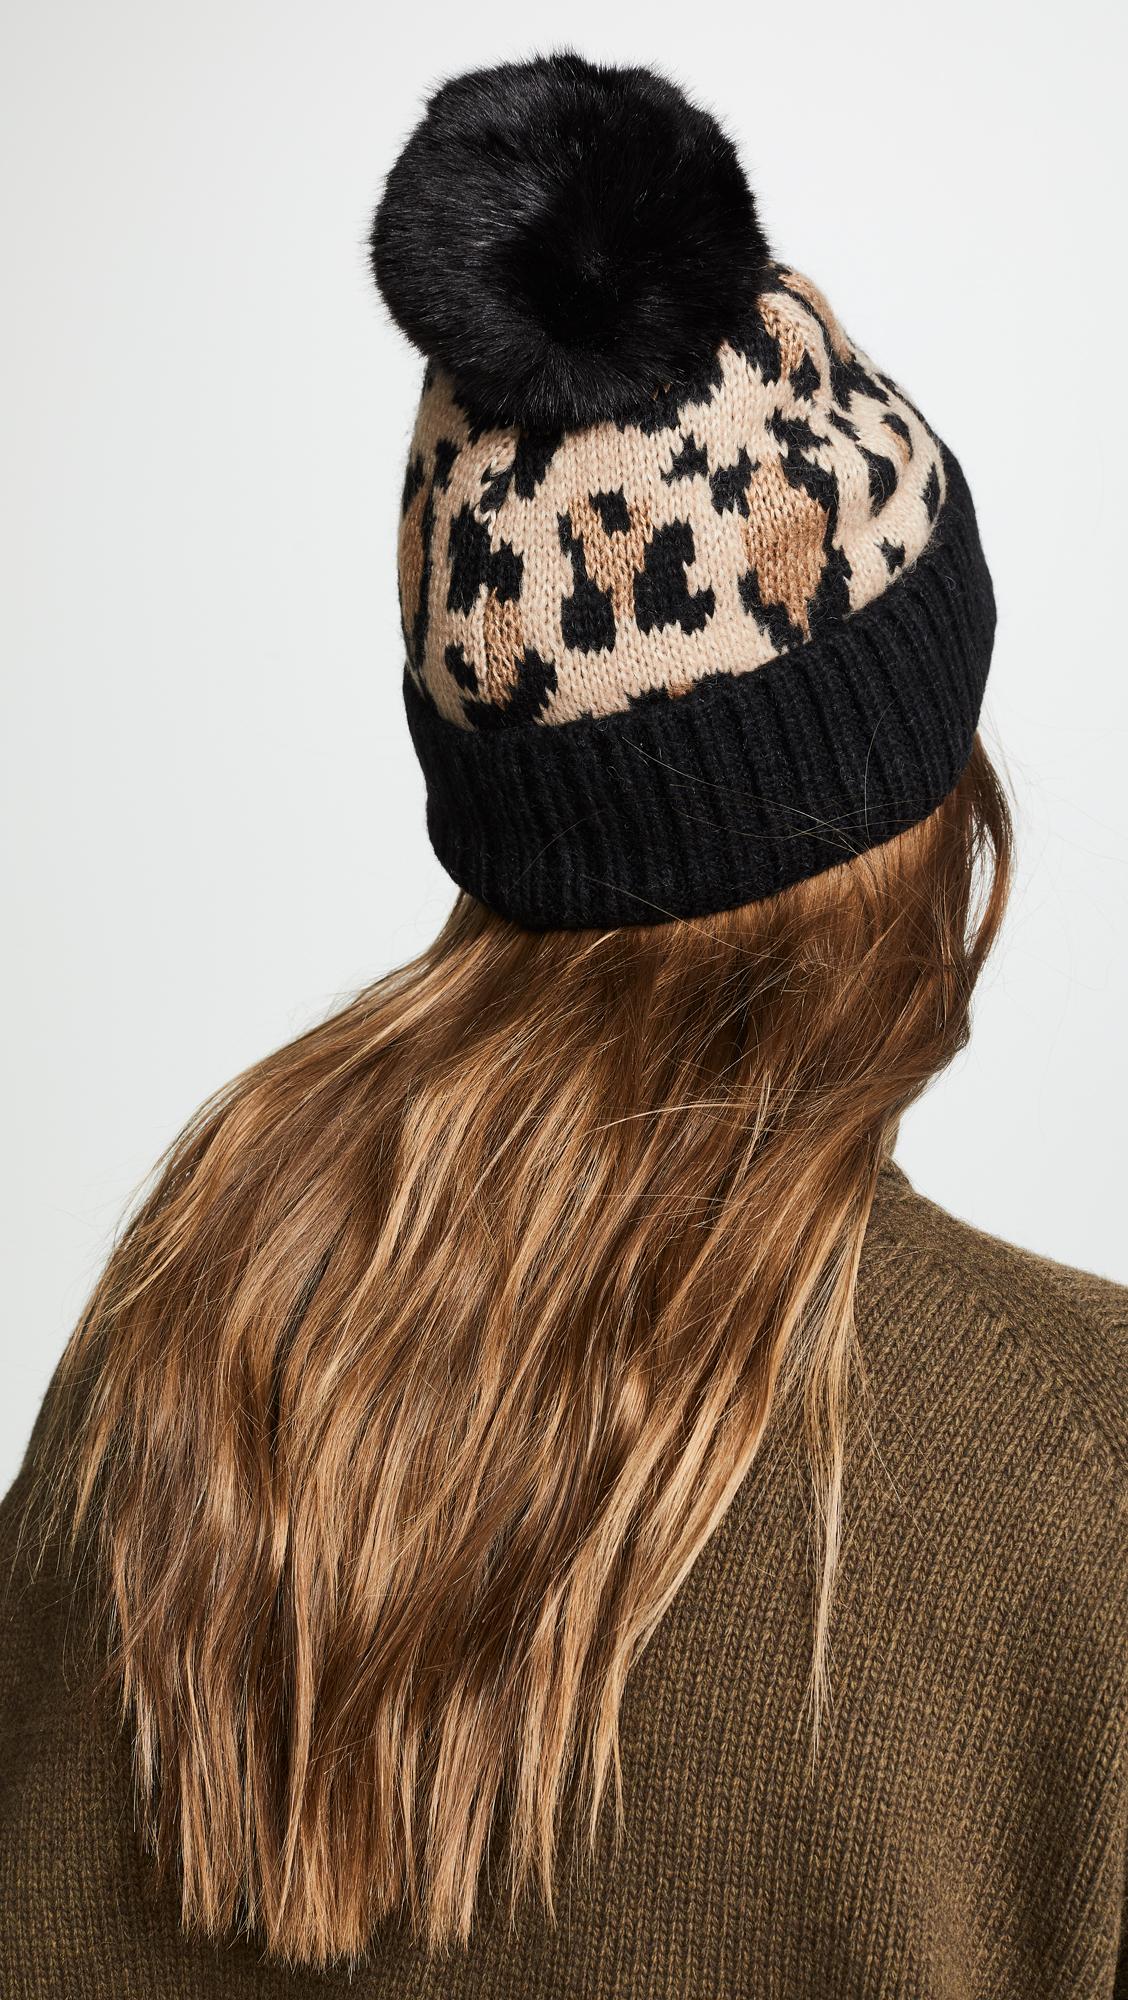 c0989404a5fd Kate Spade New York Leopard Beanie Hat | SHOPBOP